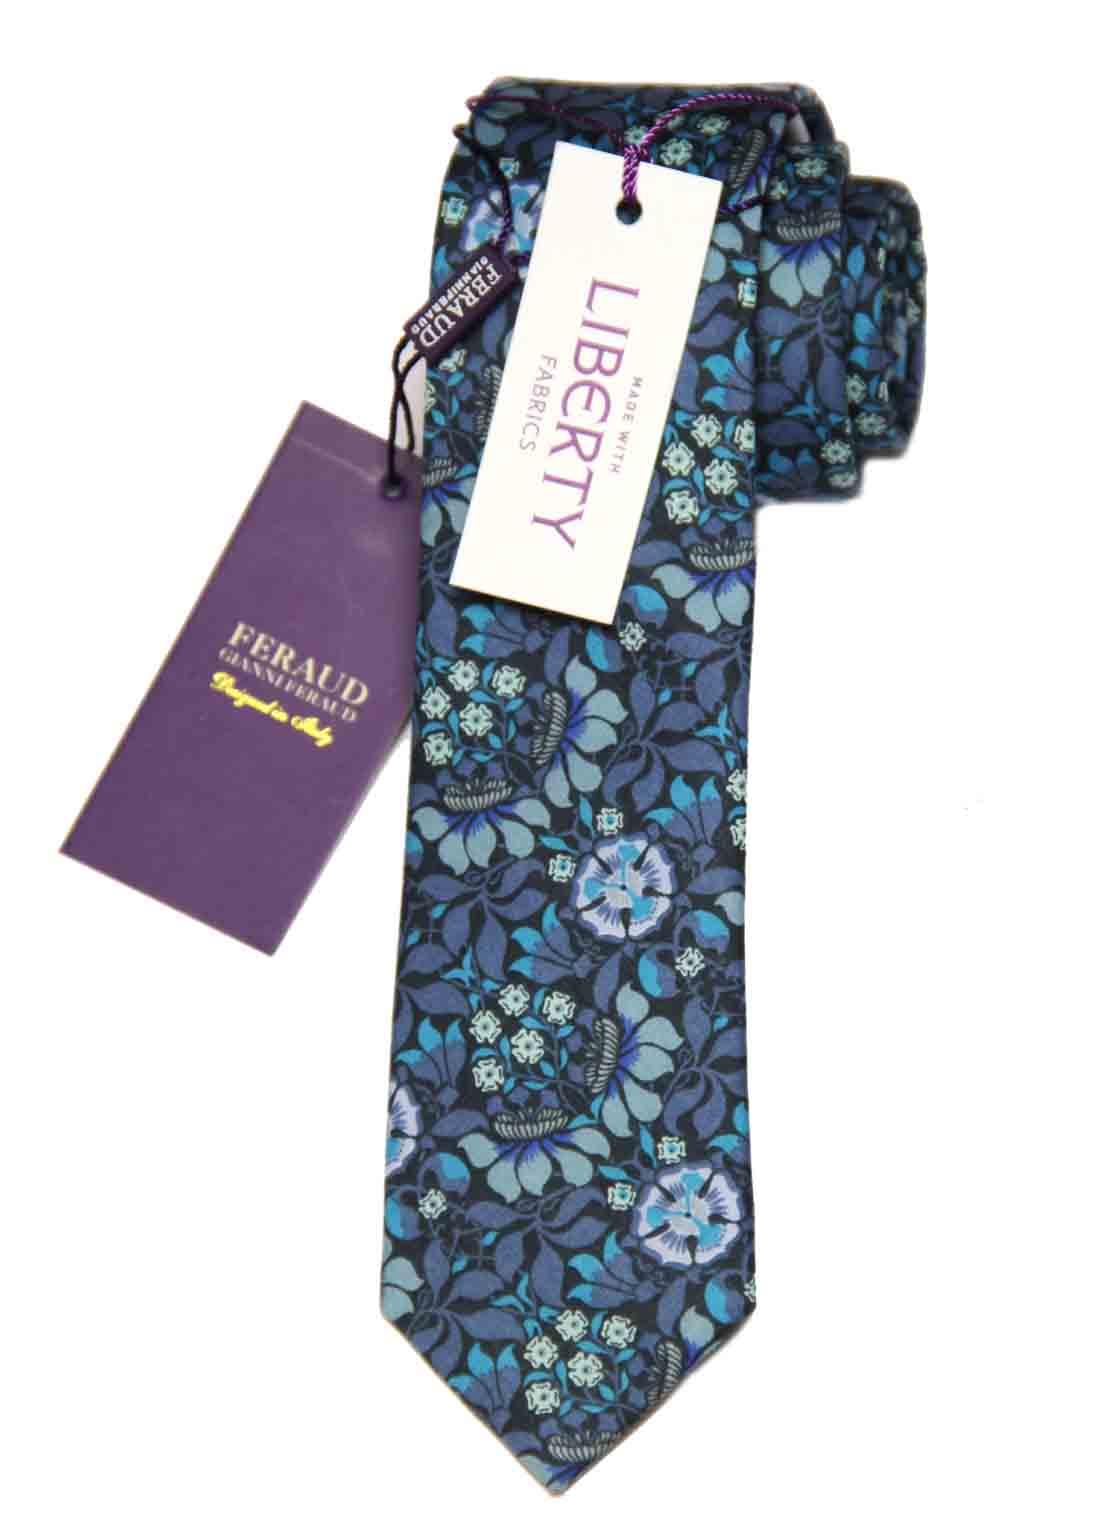 Feraud Liberty of London Fabric Tie Cotton Floral Men's Long